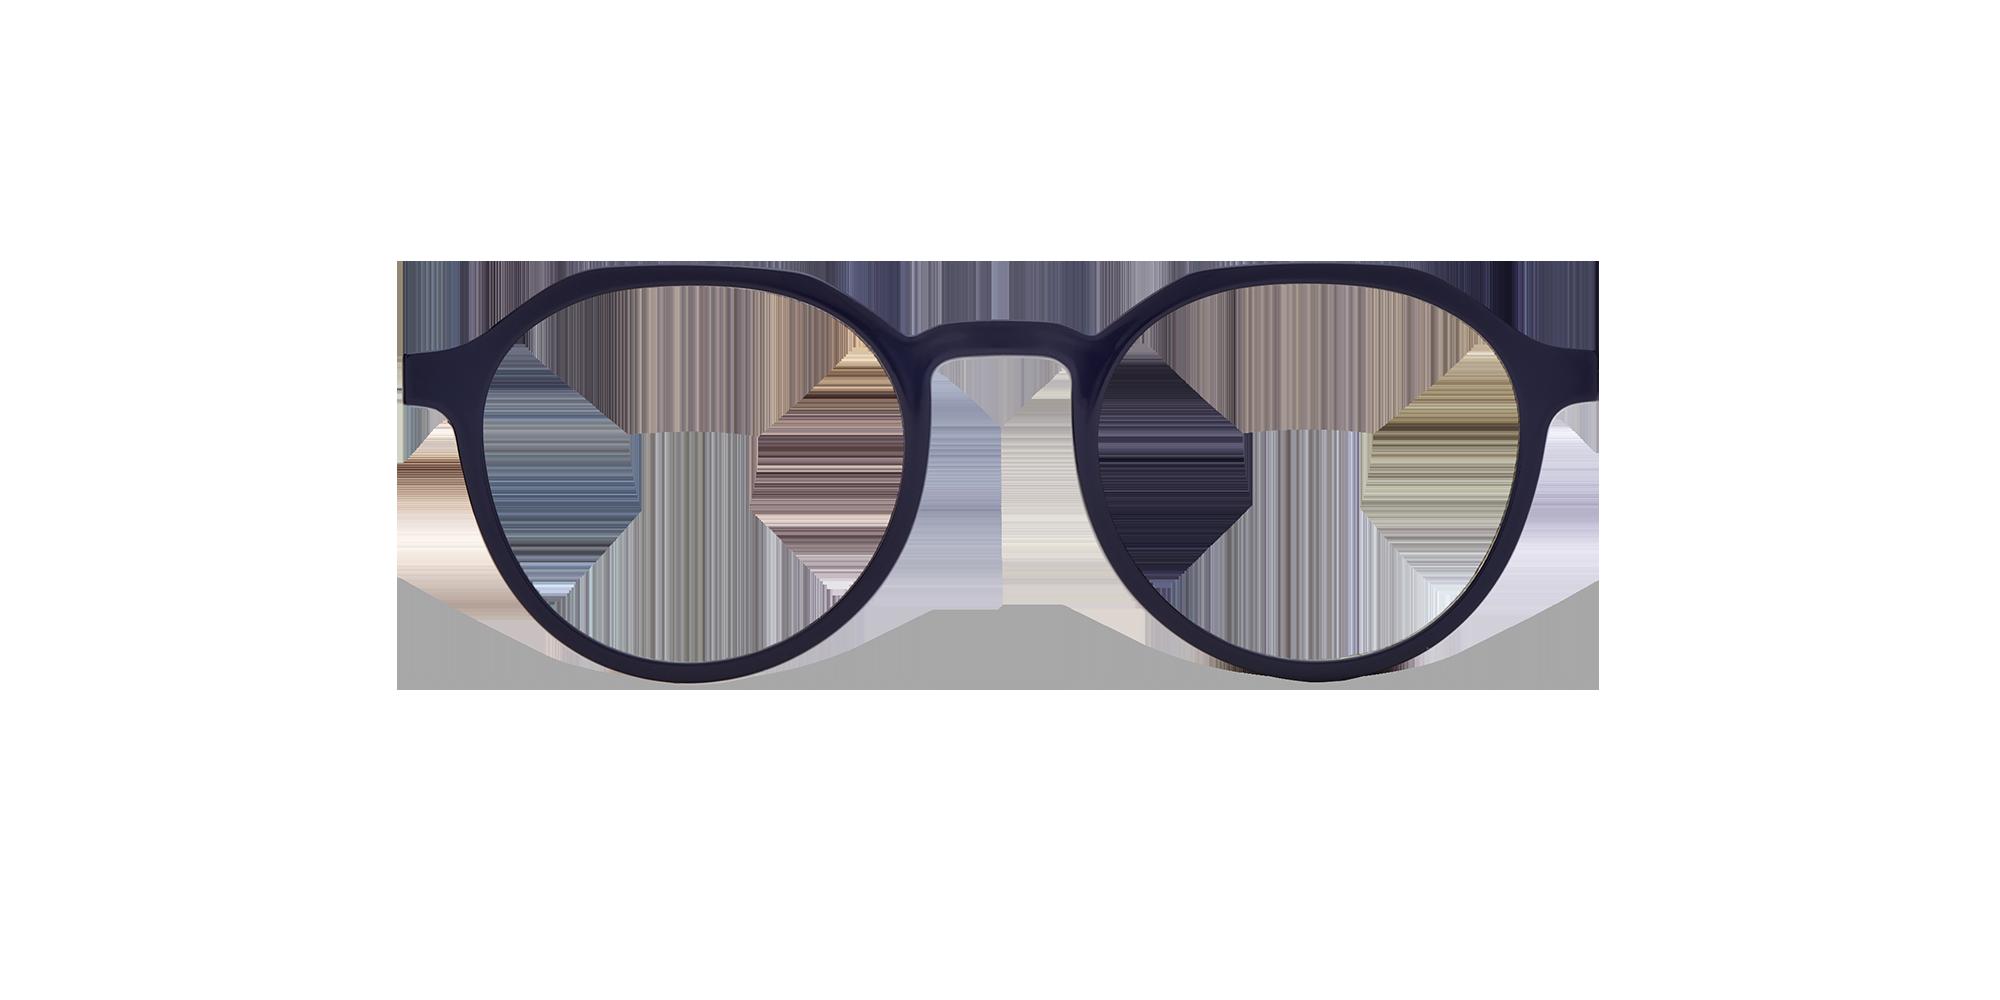 afflelou/france/products/smart_clip/clips_glasses/07630036428993_face.png